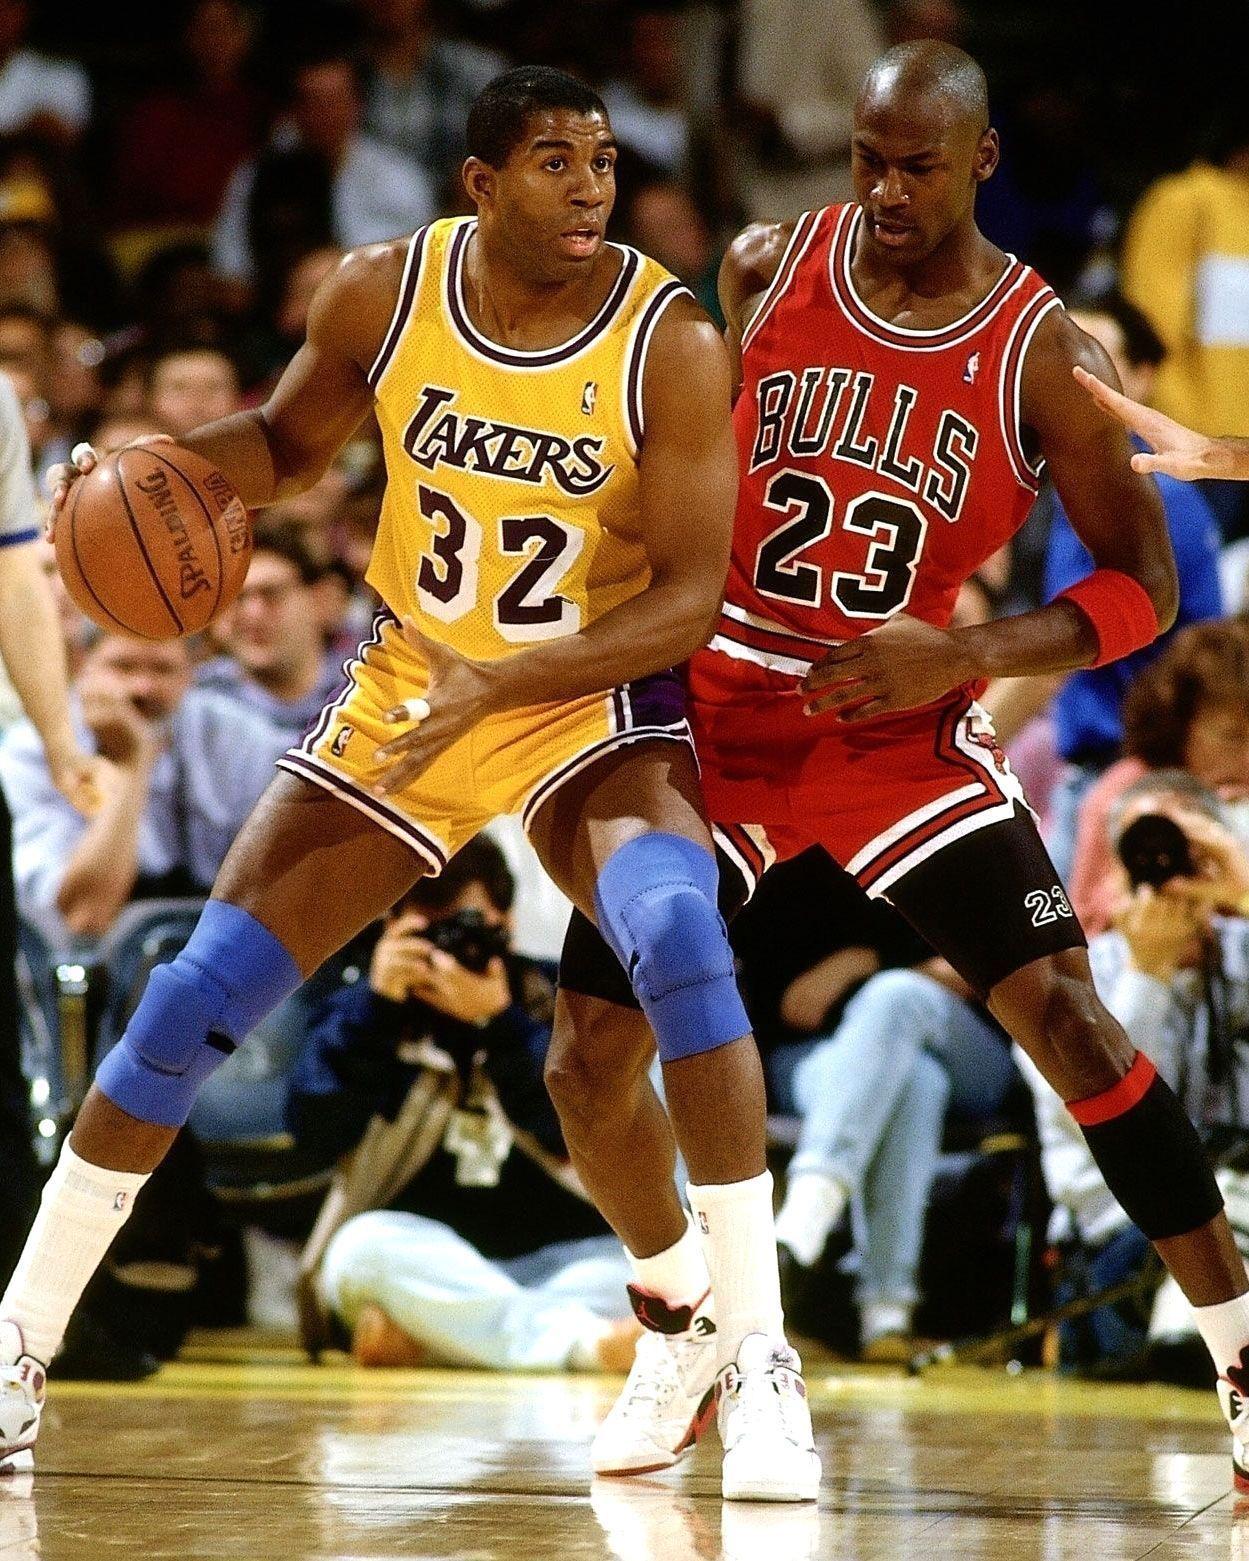 5c71cba8c7ca MICHAEL JORDAN AND MAGIC JOHNSON NBA LEGENDS 8X10 SPORTS PHOTO (OP-089)